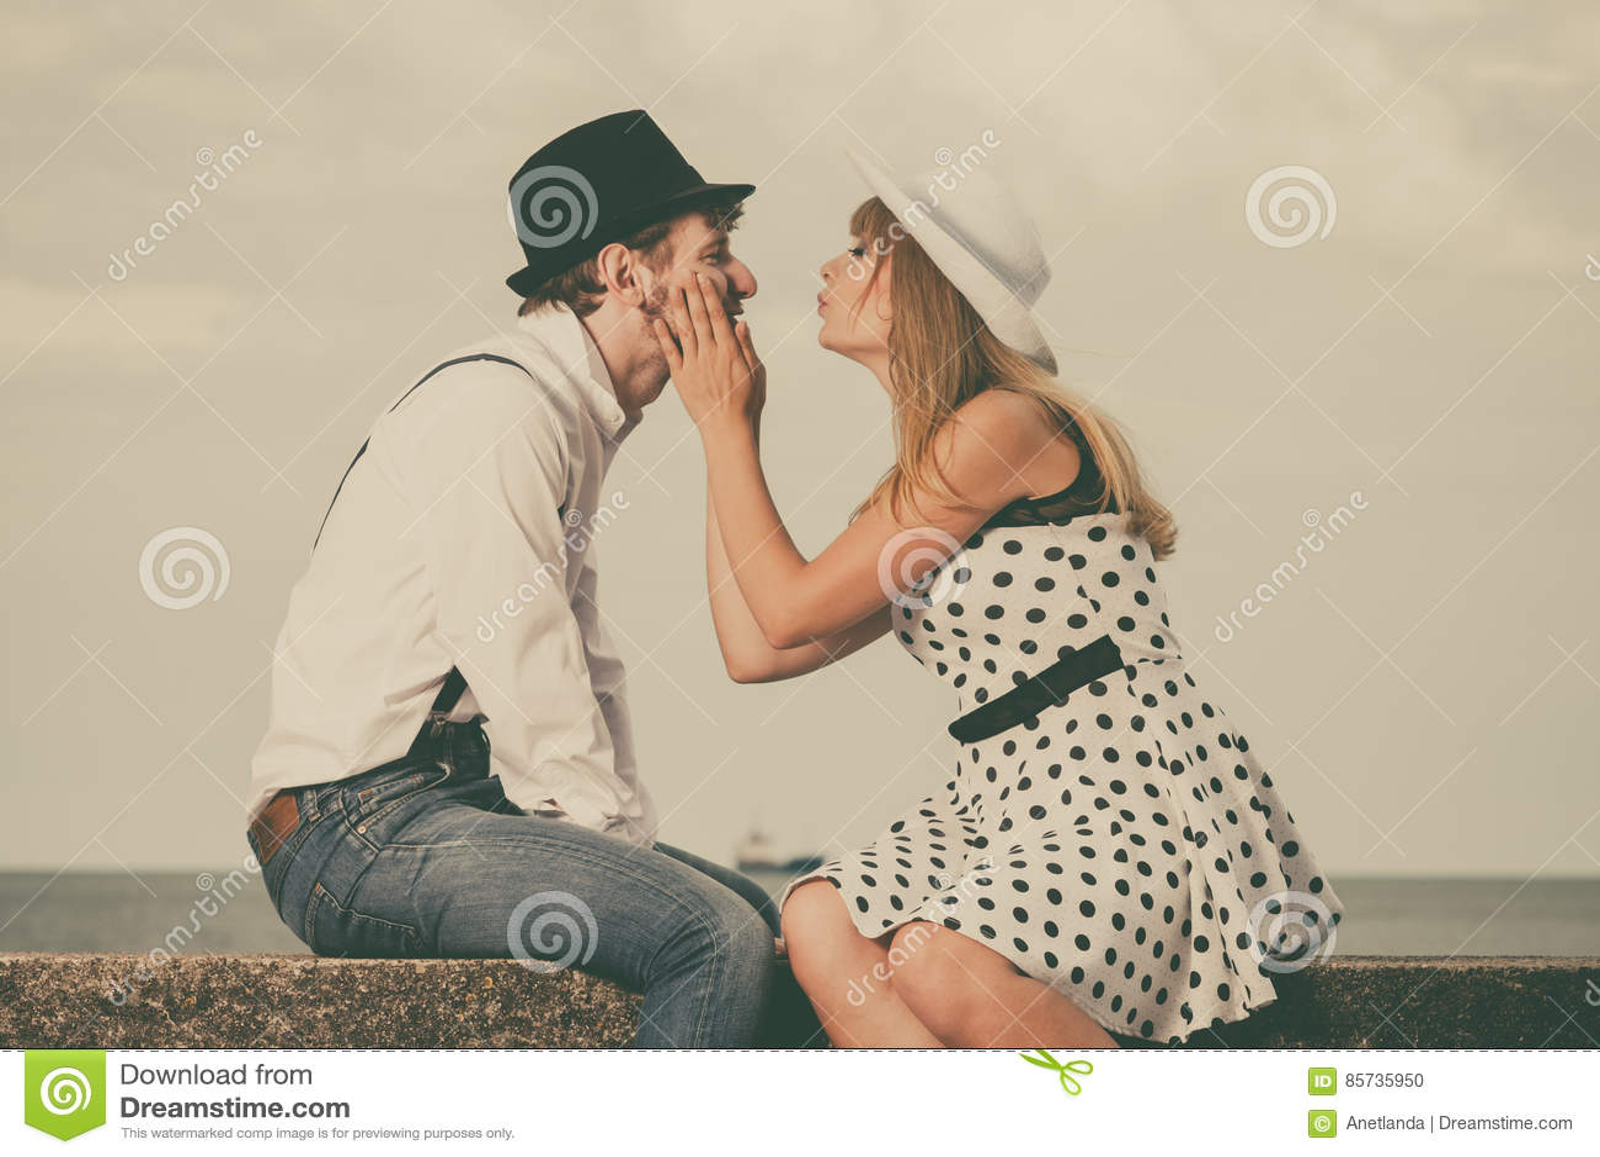 Loving dating